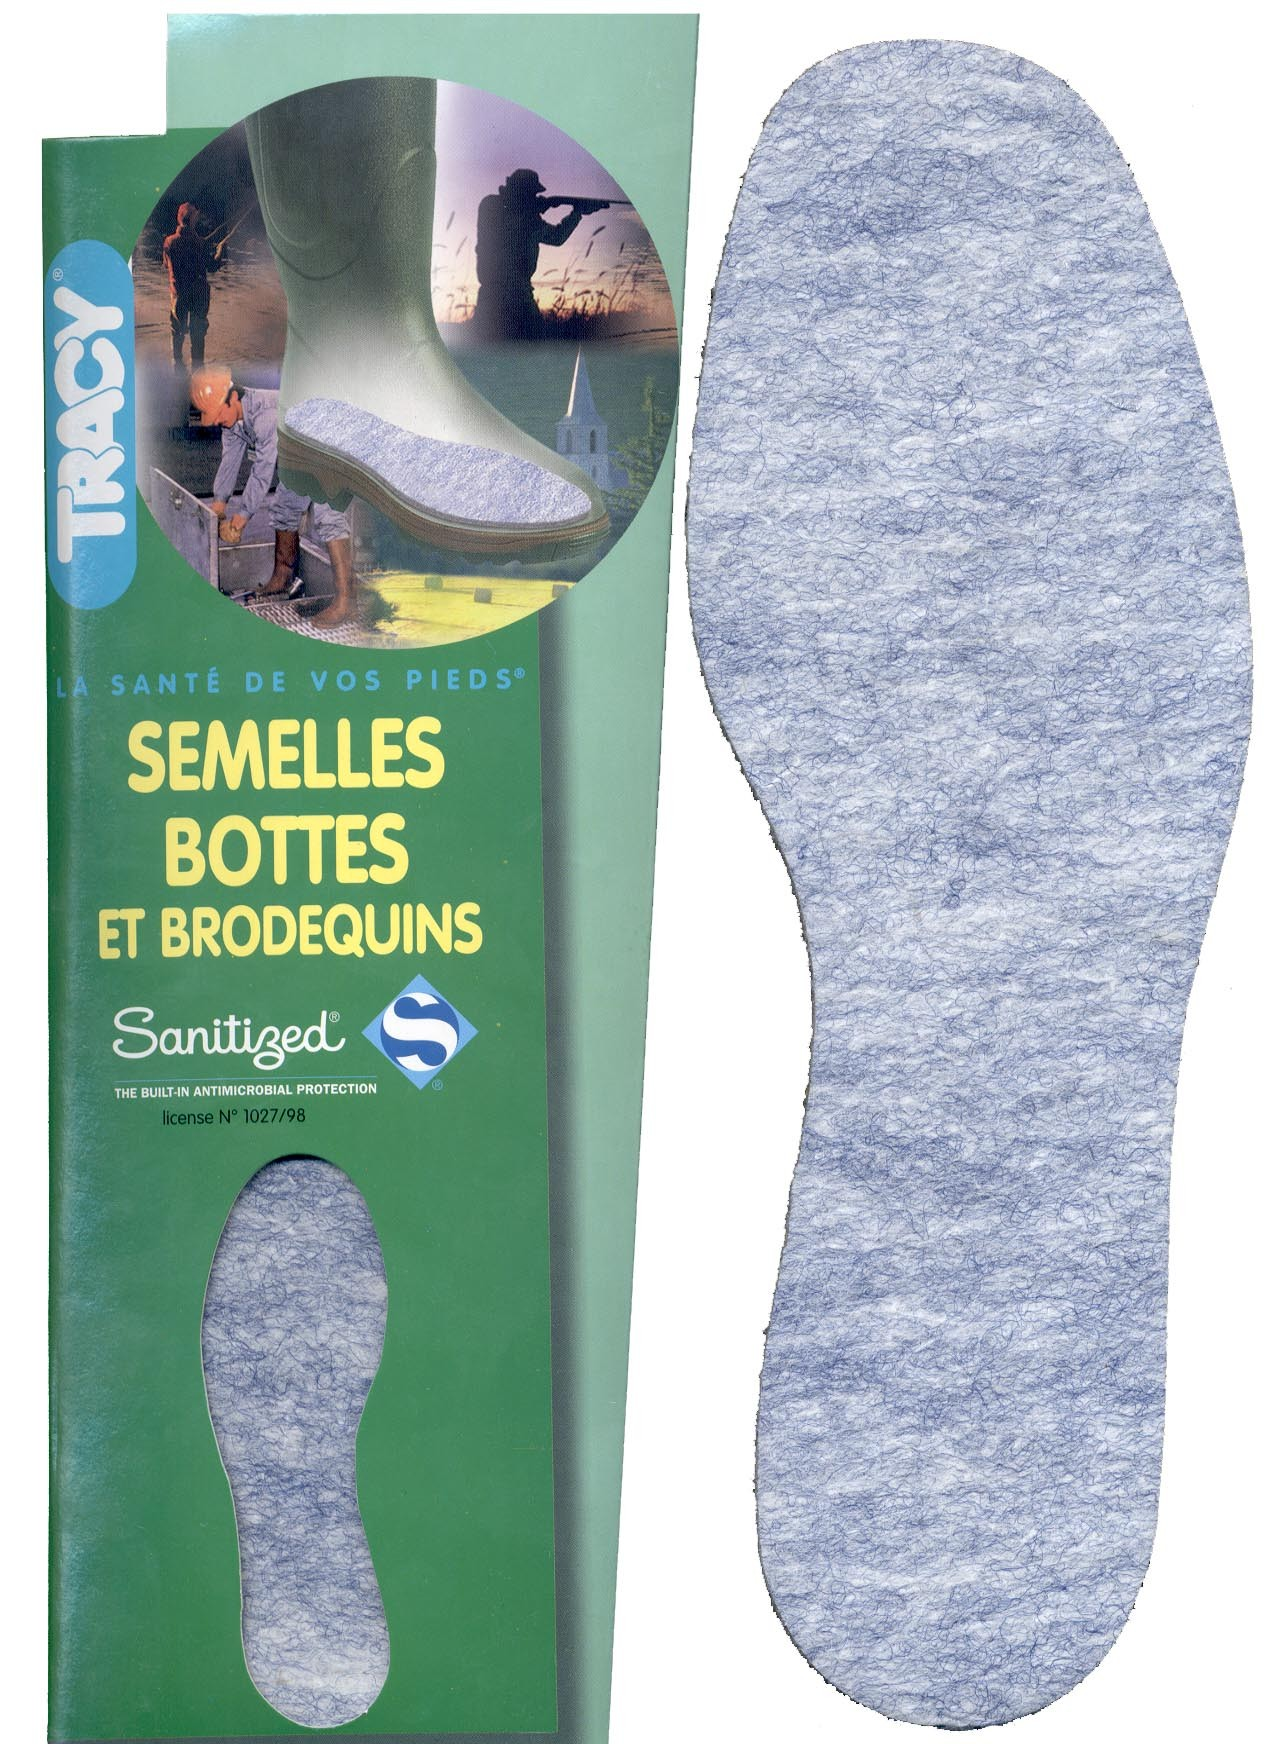 Semelle hygiene chaussures